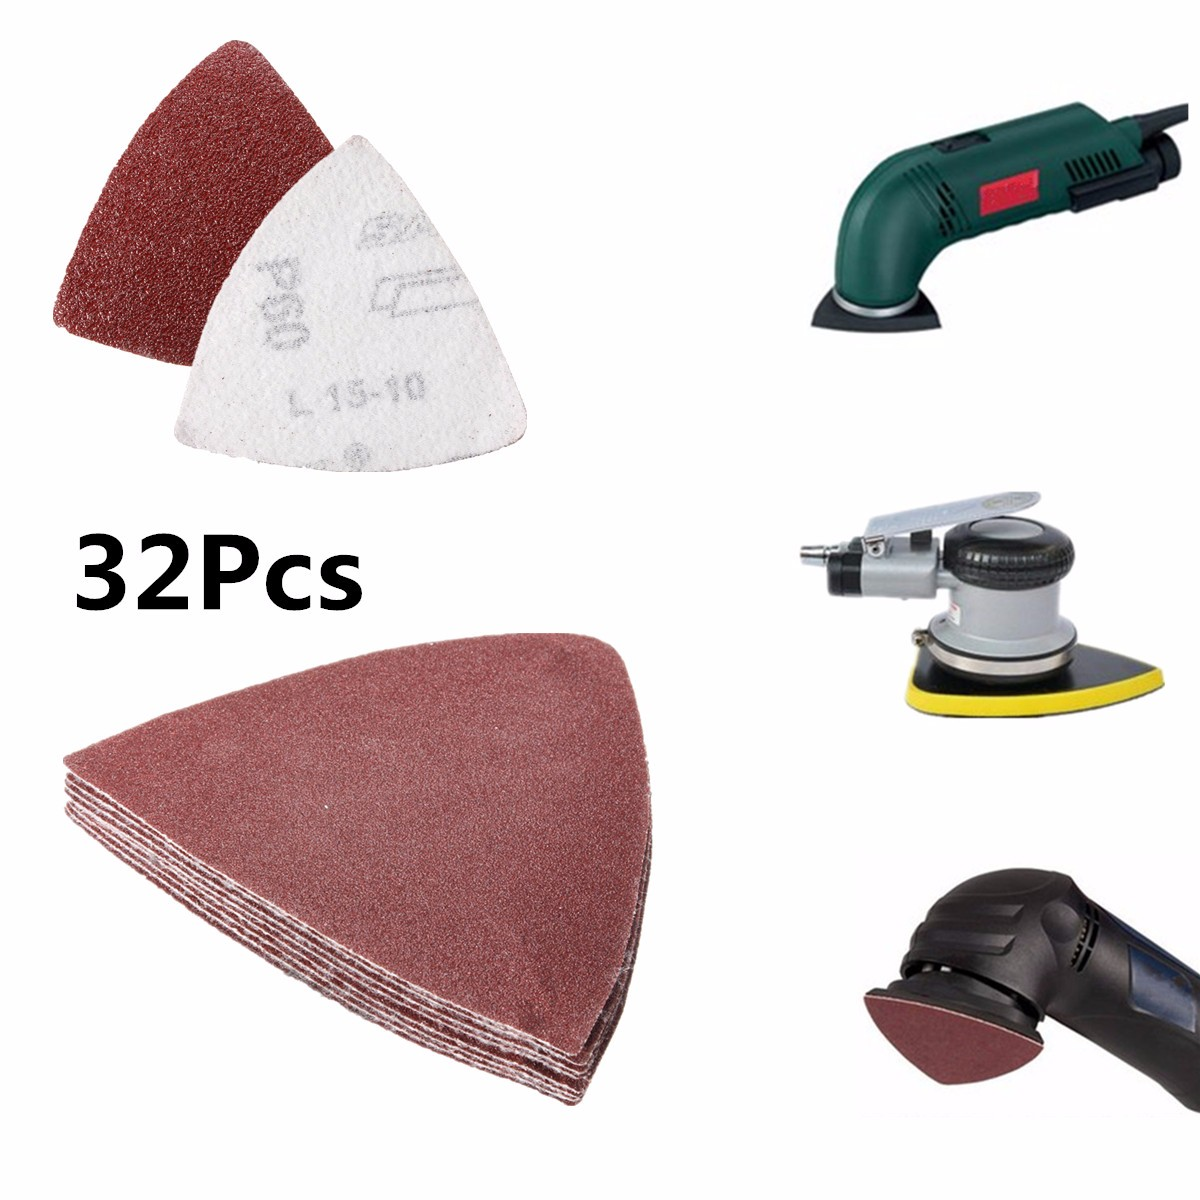 32Pcs 80mm Hook And Loop Delta Sand Paper Sanding Sheet For Oscillating Multi-Tools 60 120 180 240 Grit